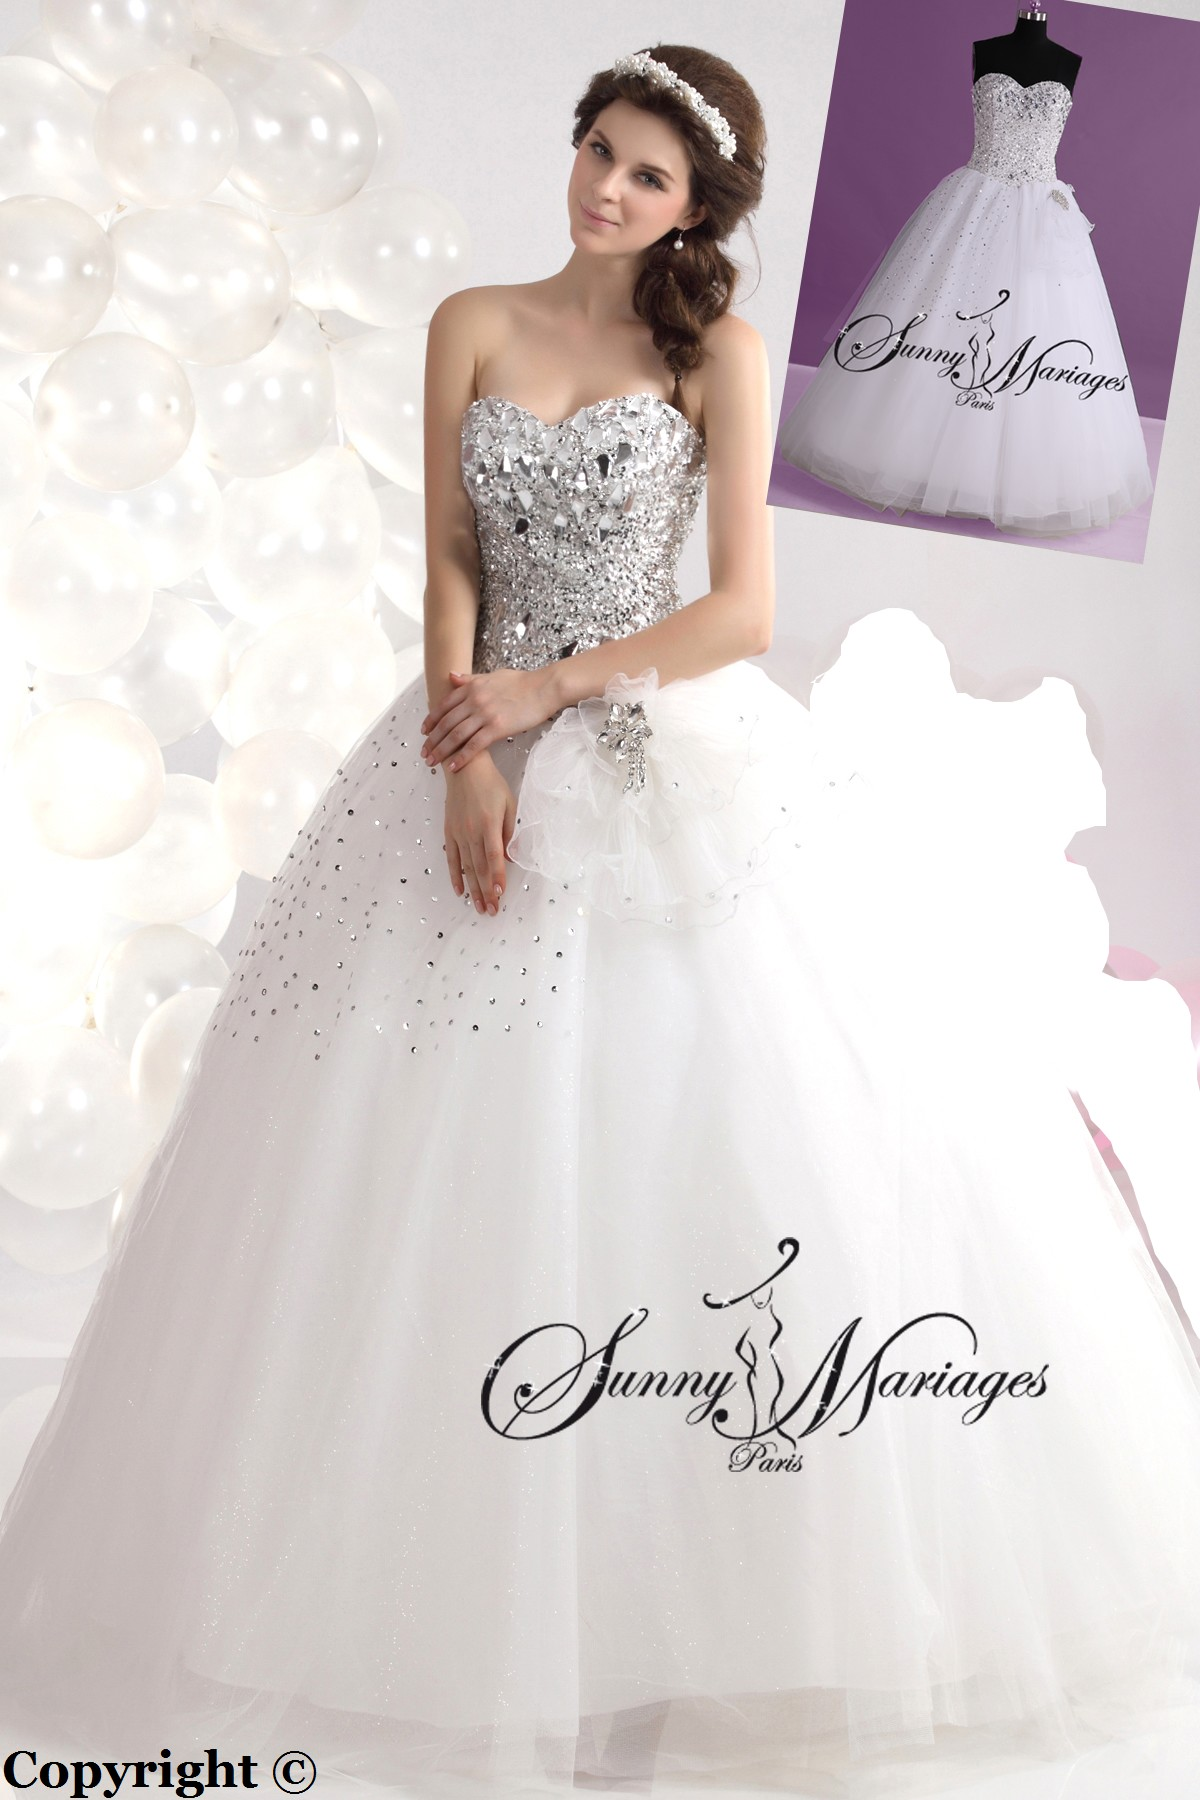 robe de mariage forme princesse blanche avec bustier coeur et sunny mariage. Black Bedroom Furniture Sets. Home Design Ideas